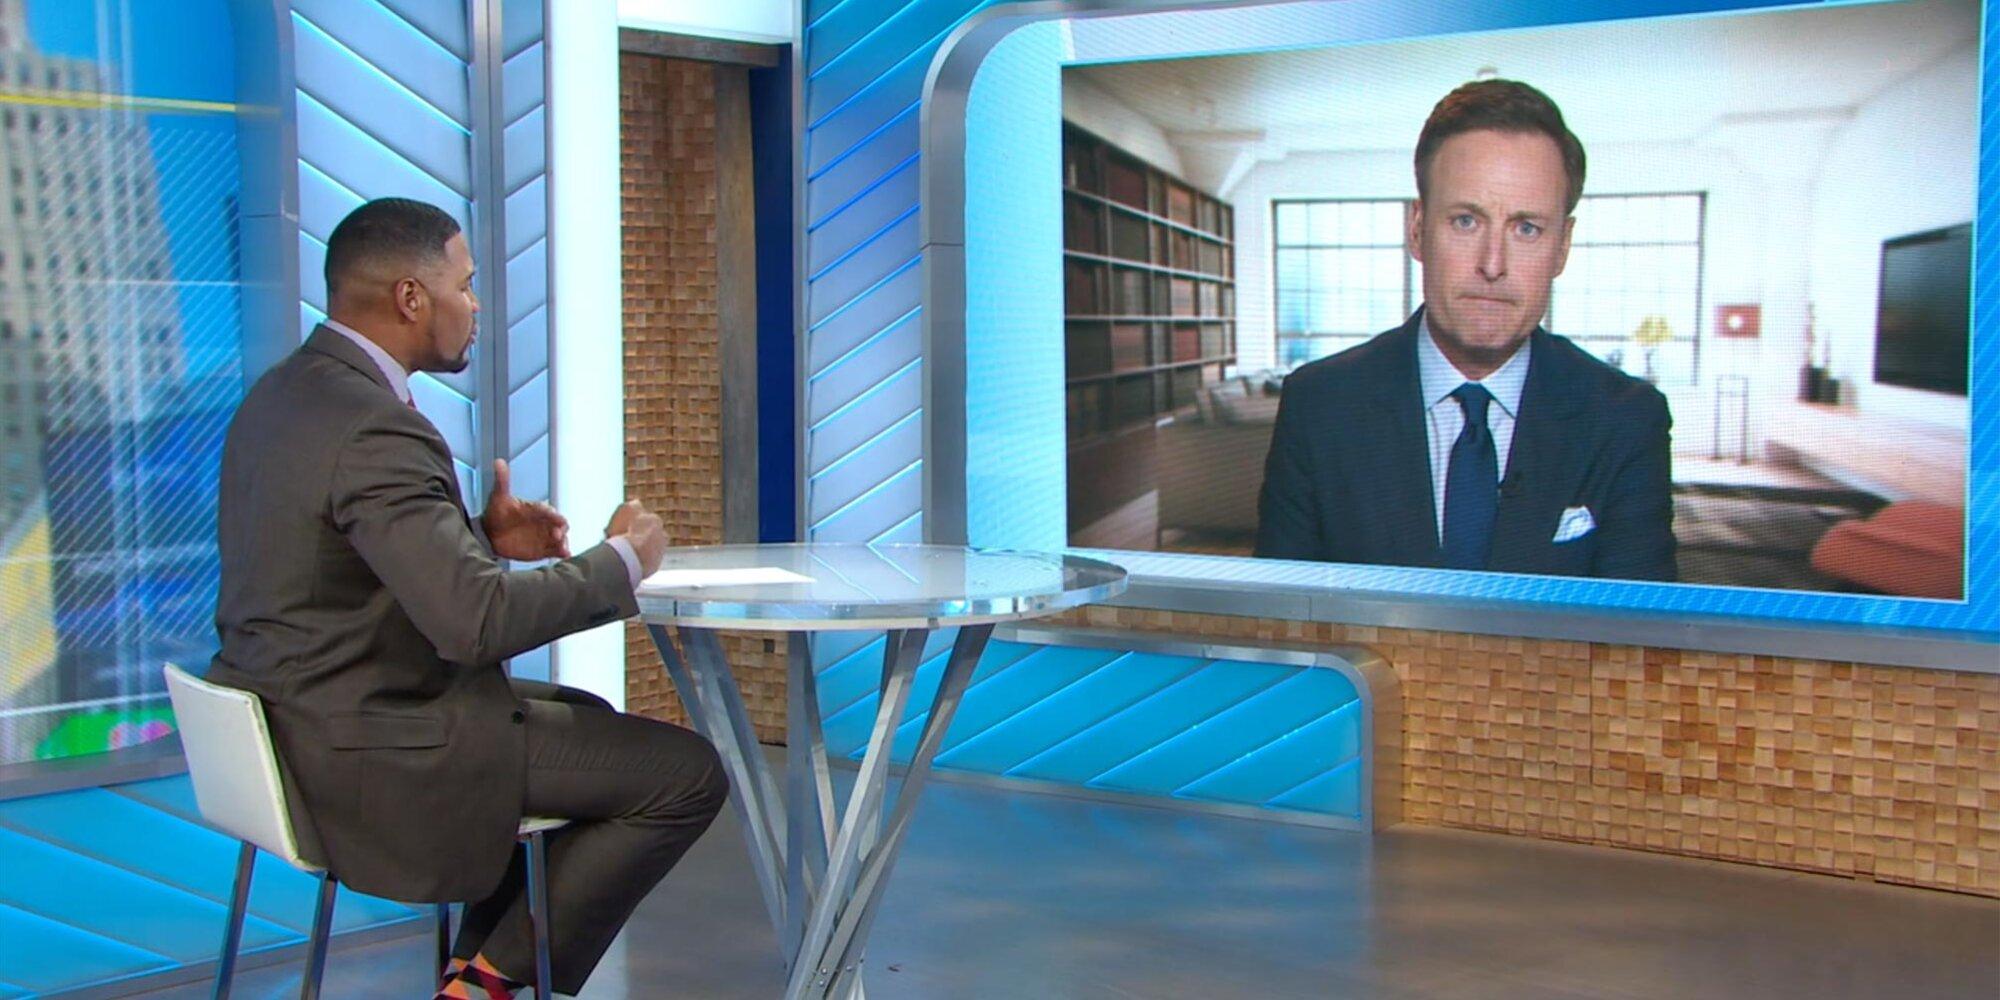 GMA's Michael Strahan calls Bachelor host Chris Harrison's apology a 'surface response'.jpg